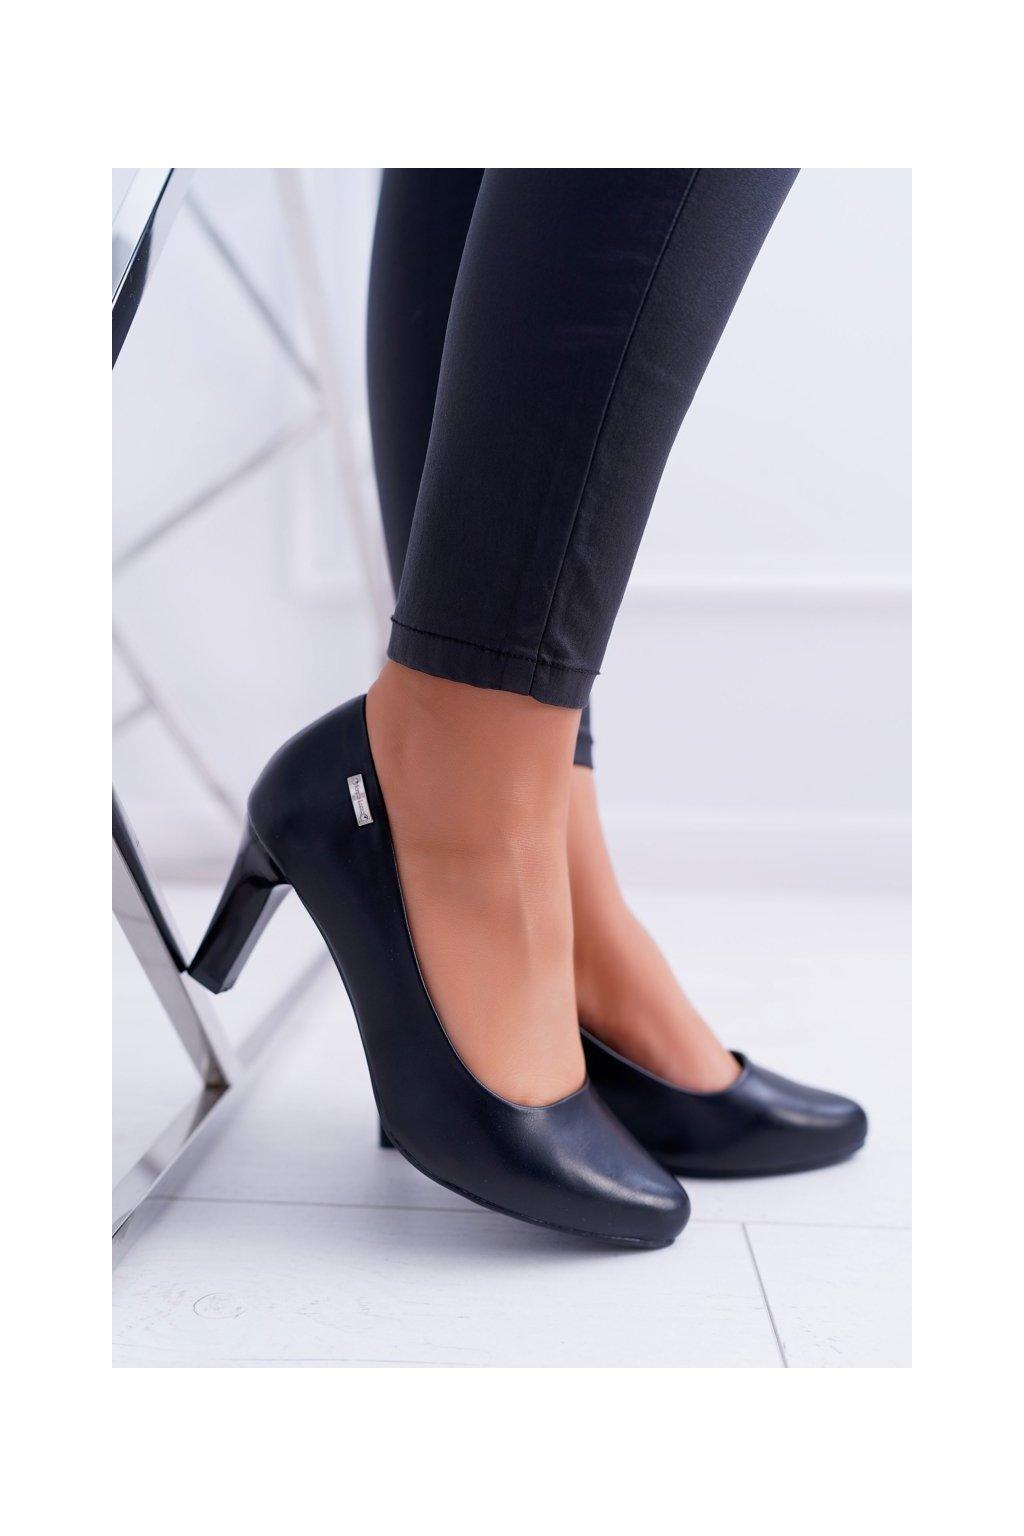 Dámske lodičky farba čierna kód obuvi 1459 BLK MAT